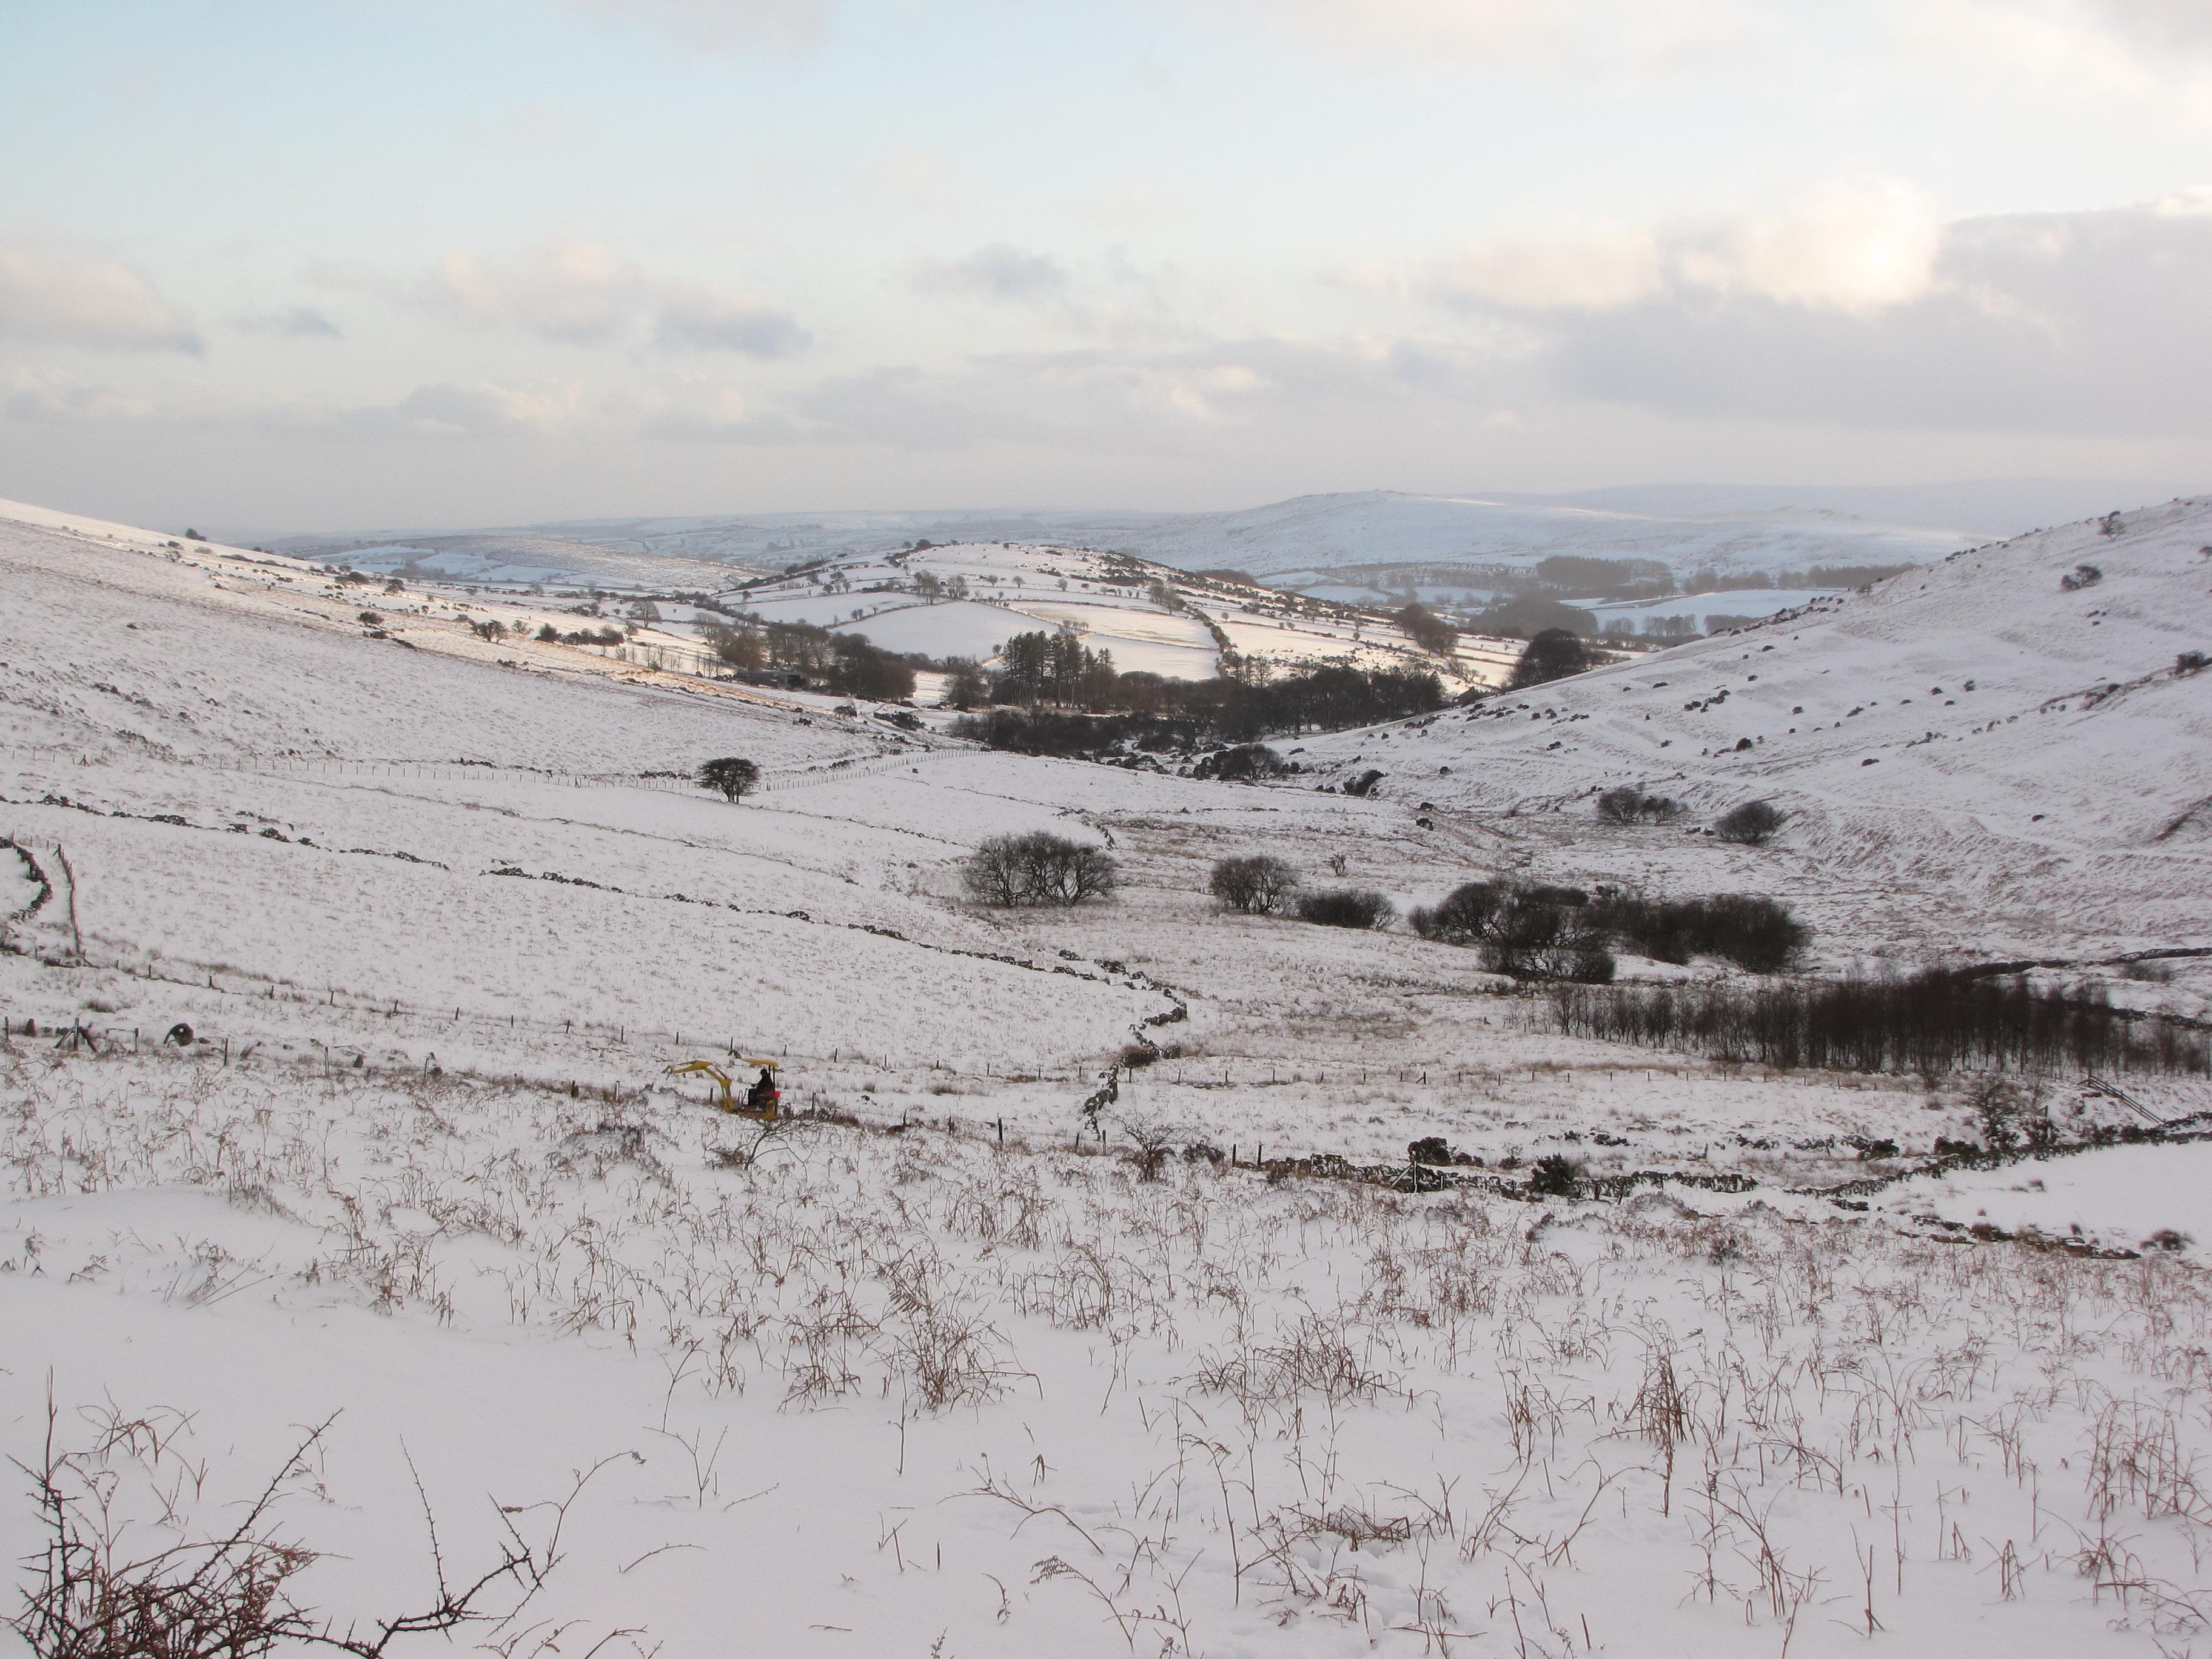 Challacombe winter wonderland